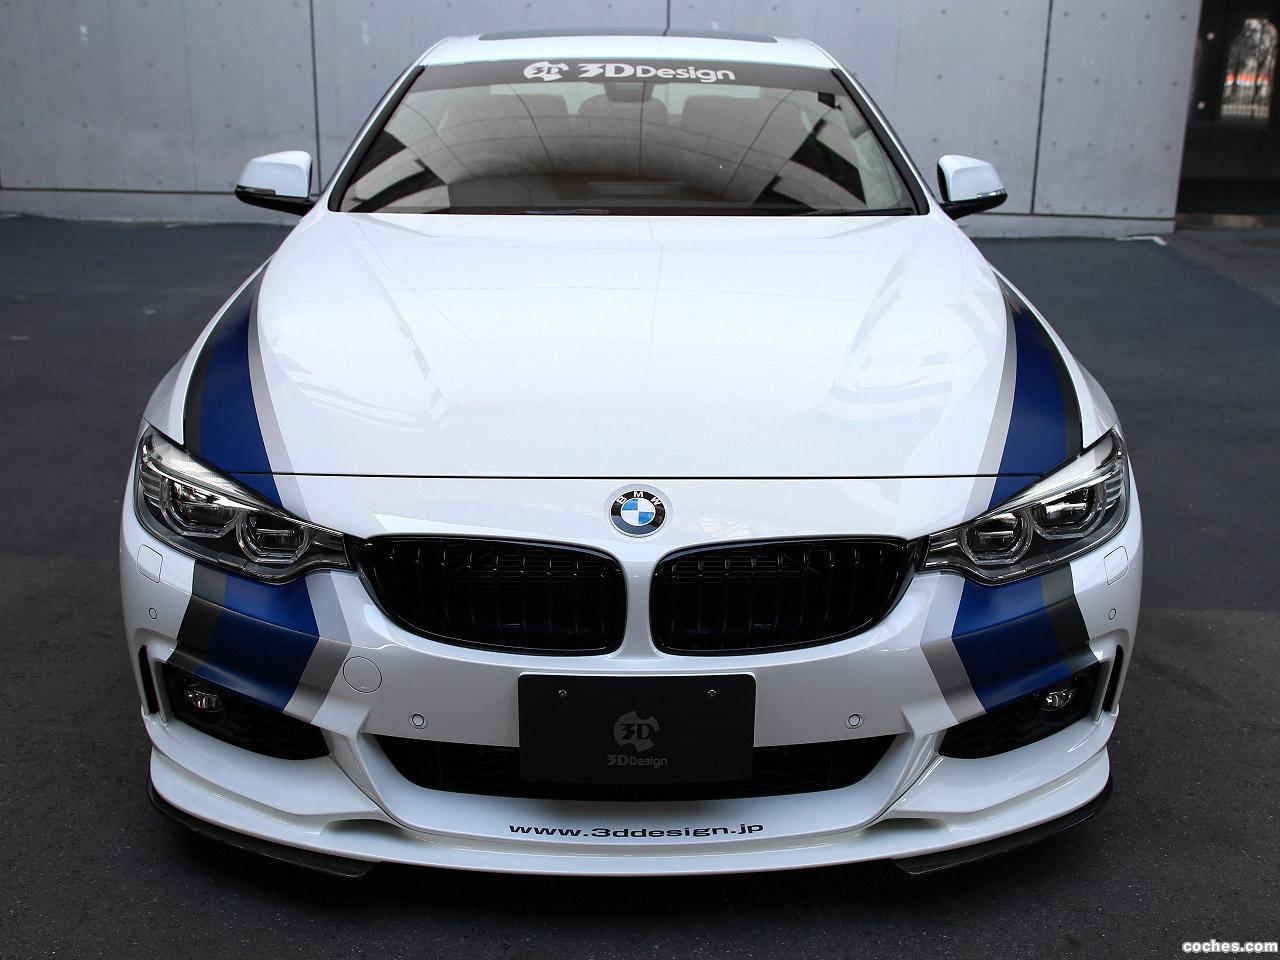 Foto 0 de BMW 3D Design Serie 4 435i 2014